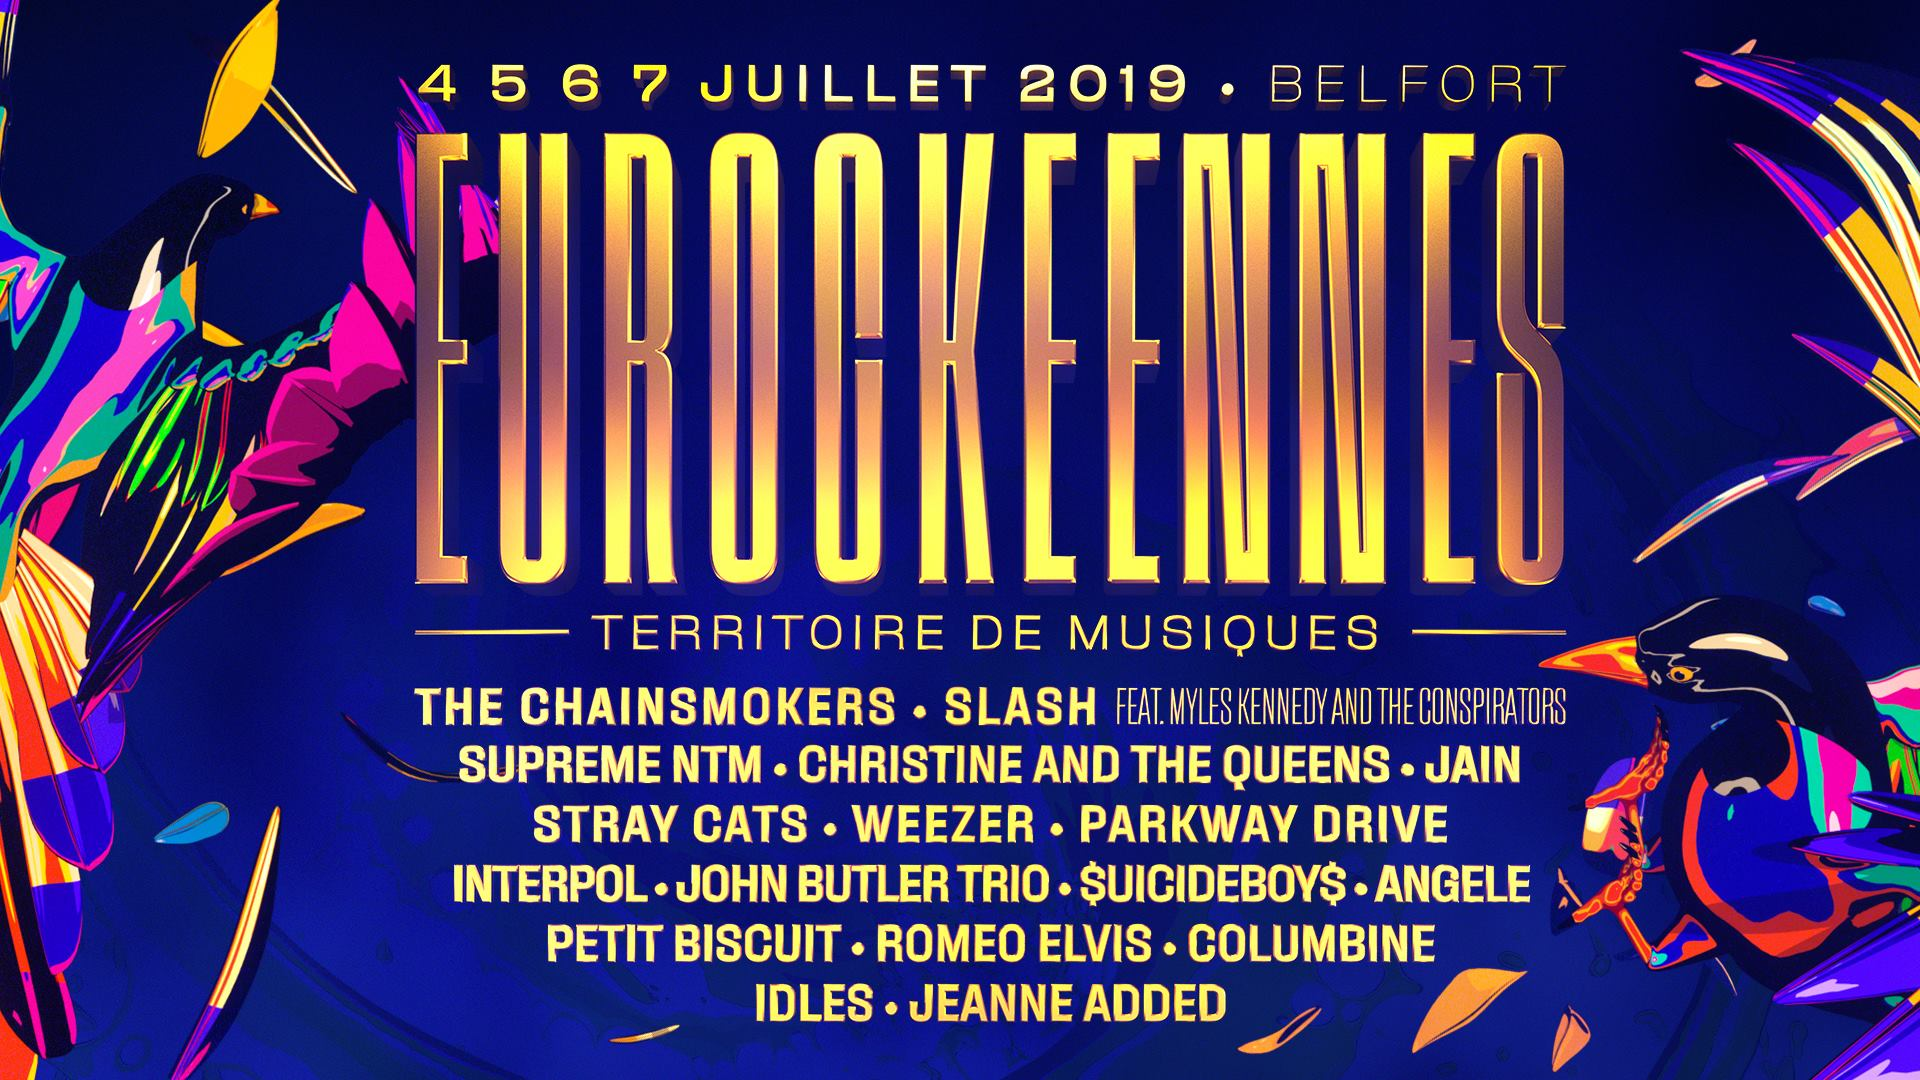 eurock u00e9ennes 2019 - 04  07  2019  4 days  - belfort - franche-comte